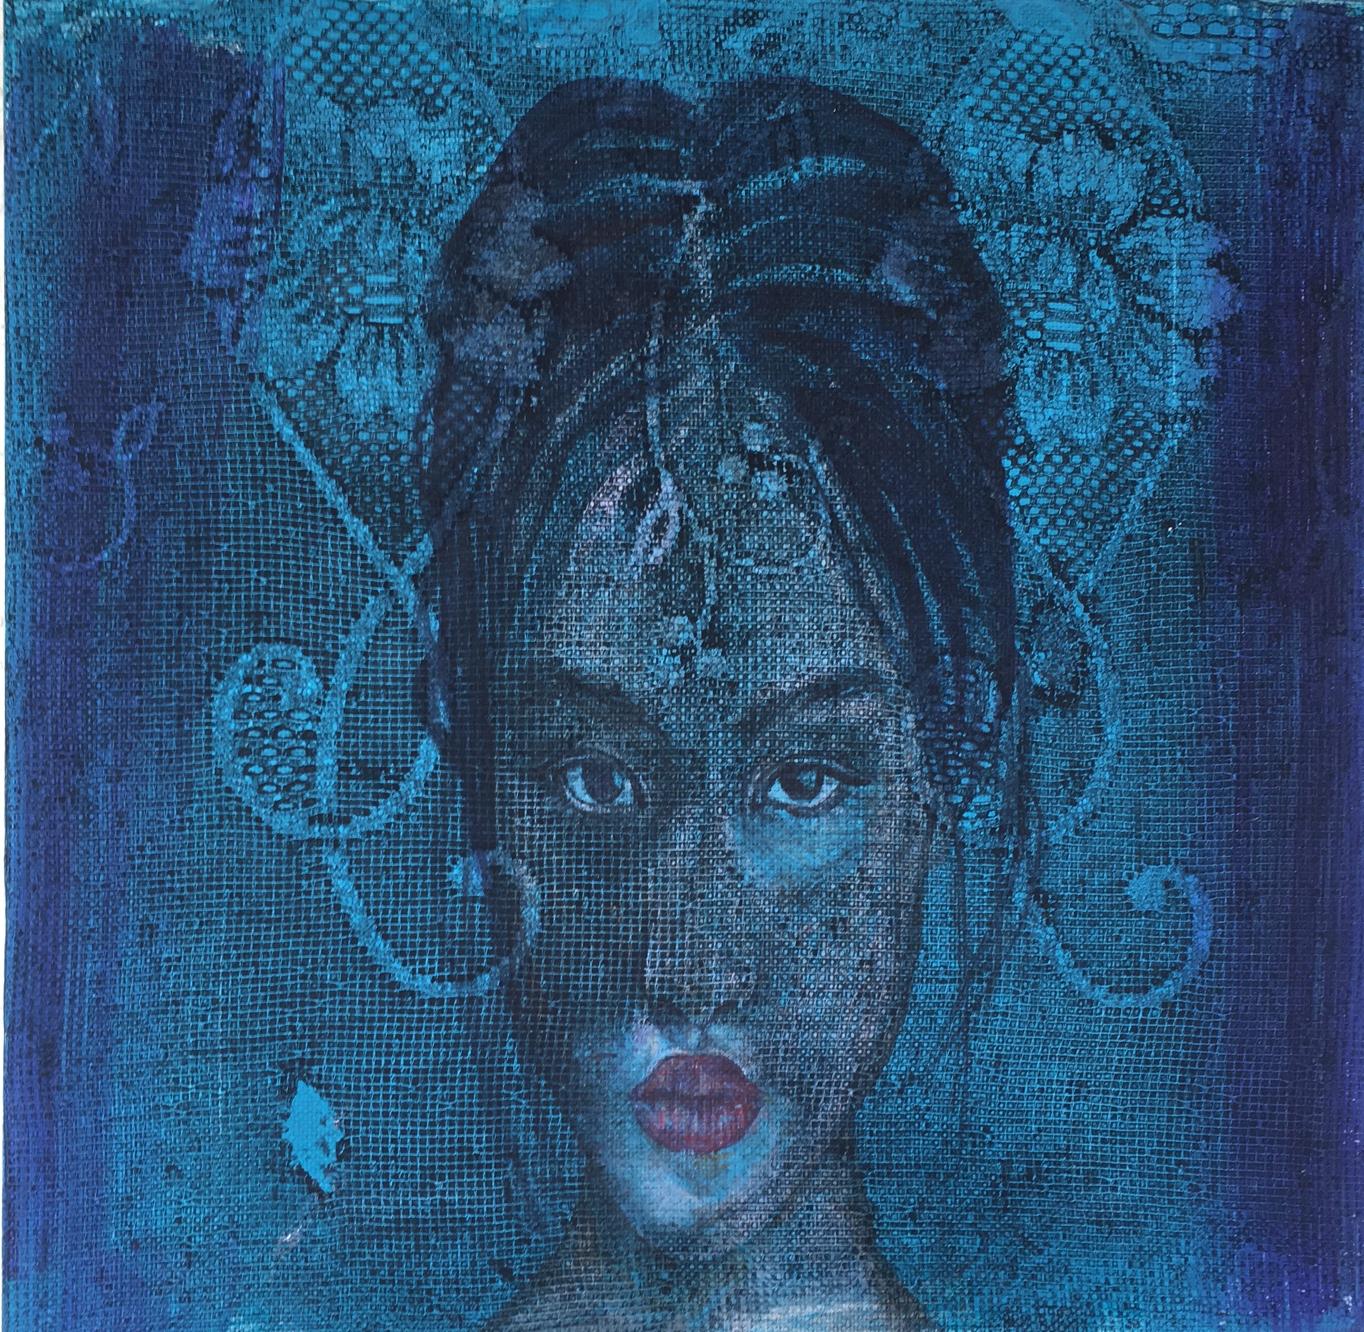 'Supermodel Blue Enigma,  Lace effect, oil on canvas, 30cm x 30cm,